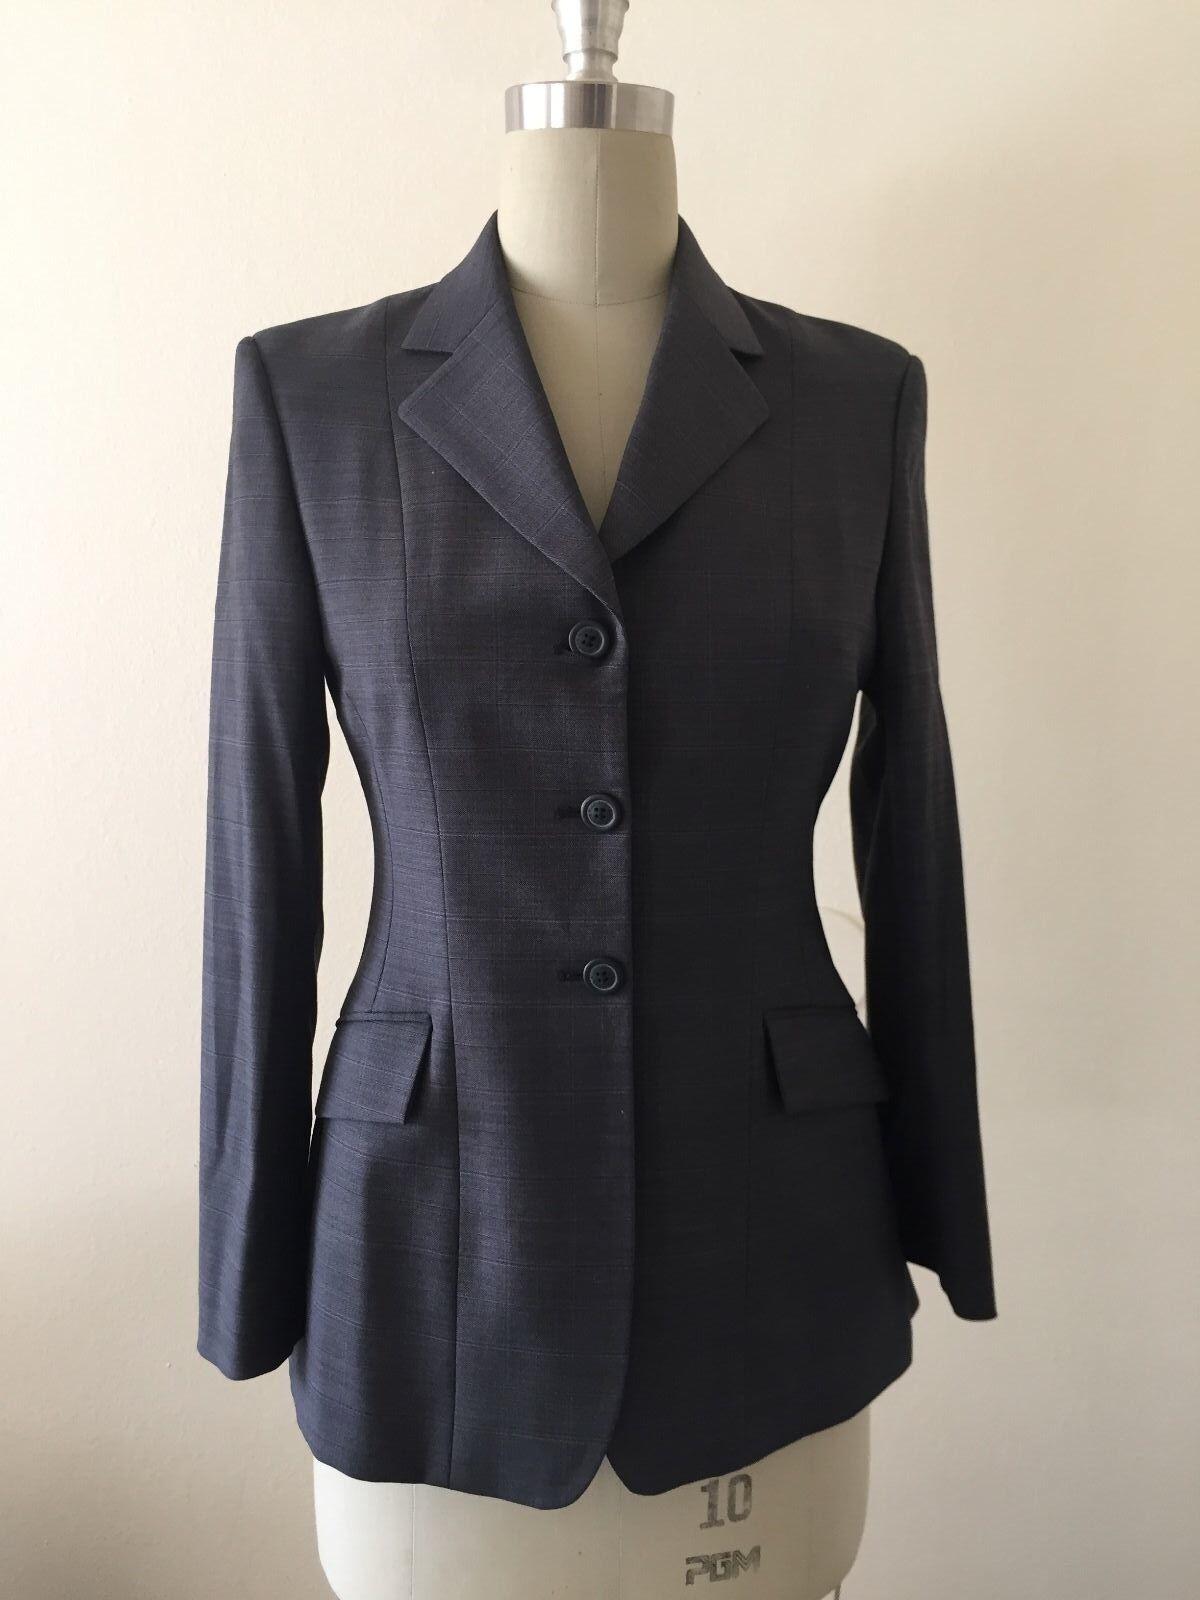 R.J. Classics Prestige Collection  Equestrian Show Coat Blazer Size 4R  support wholesale retail